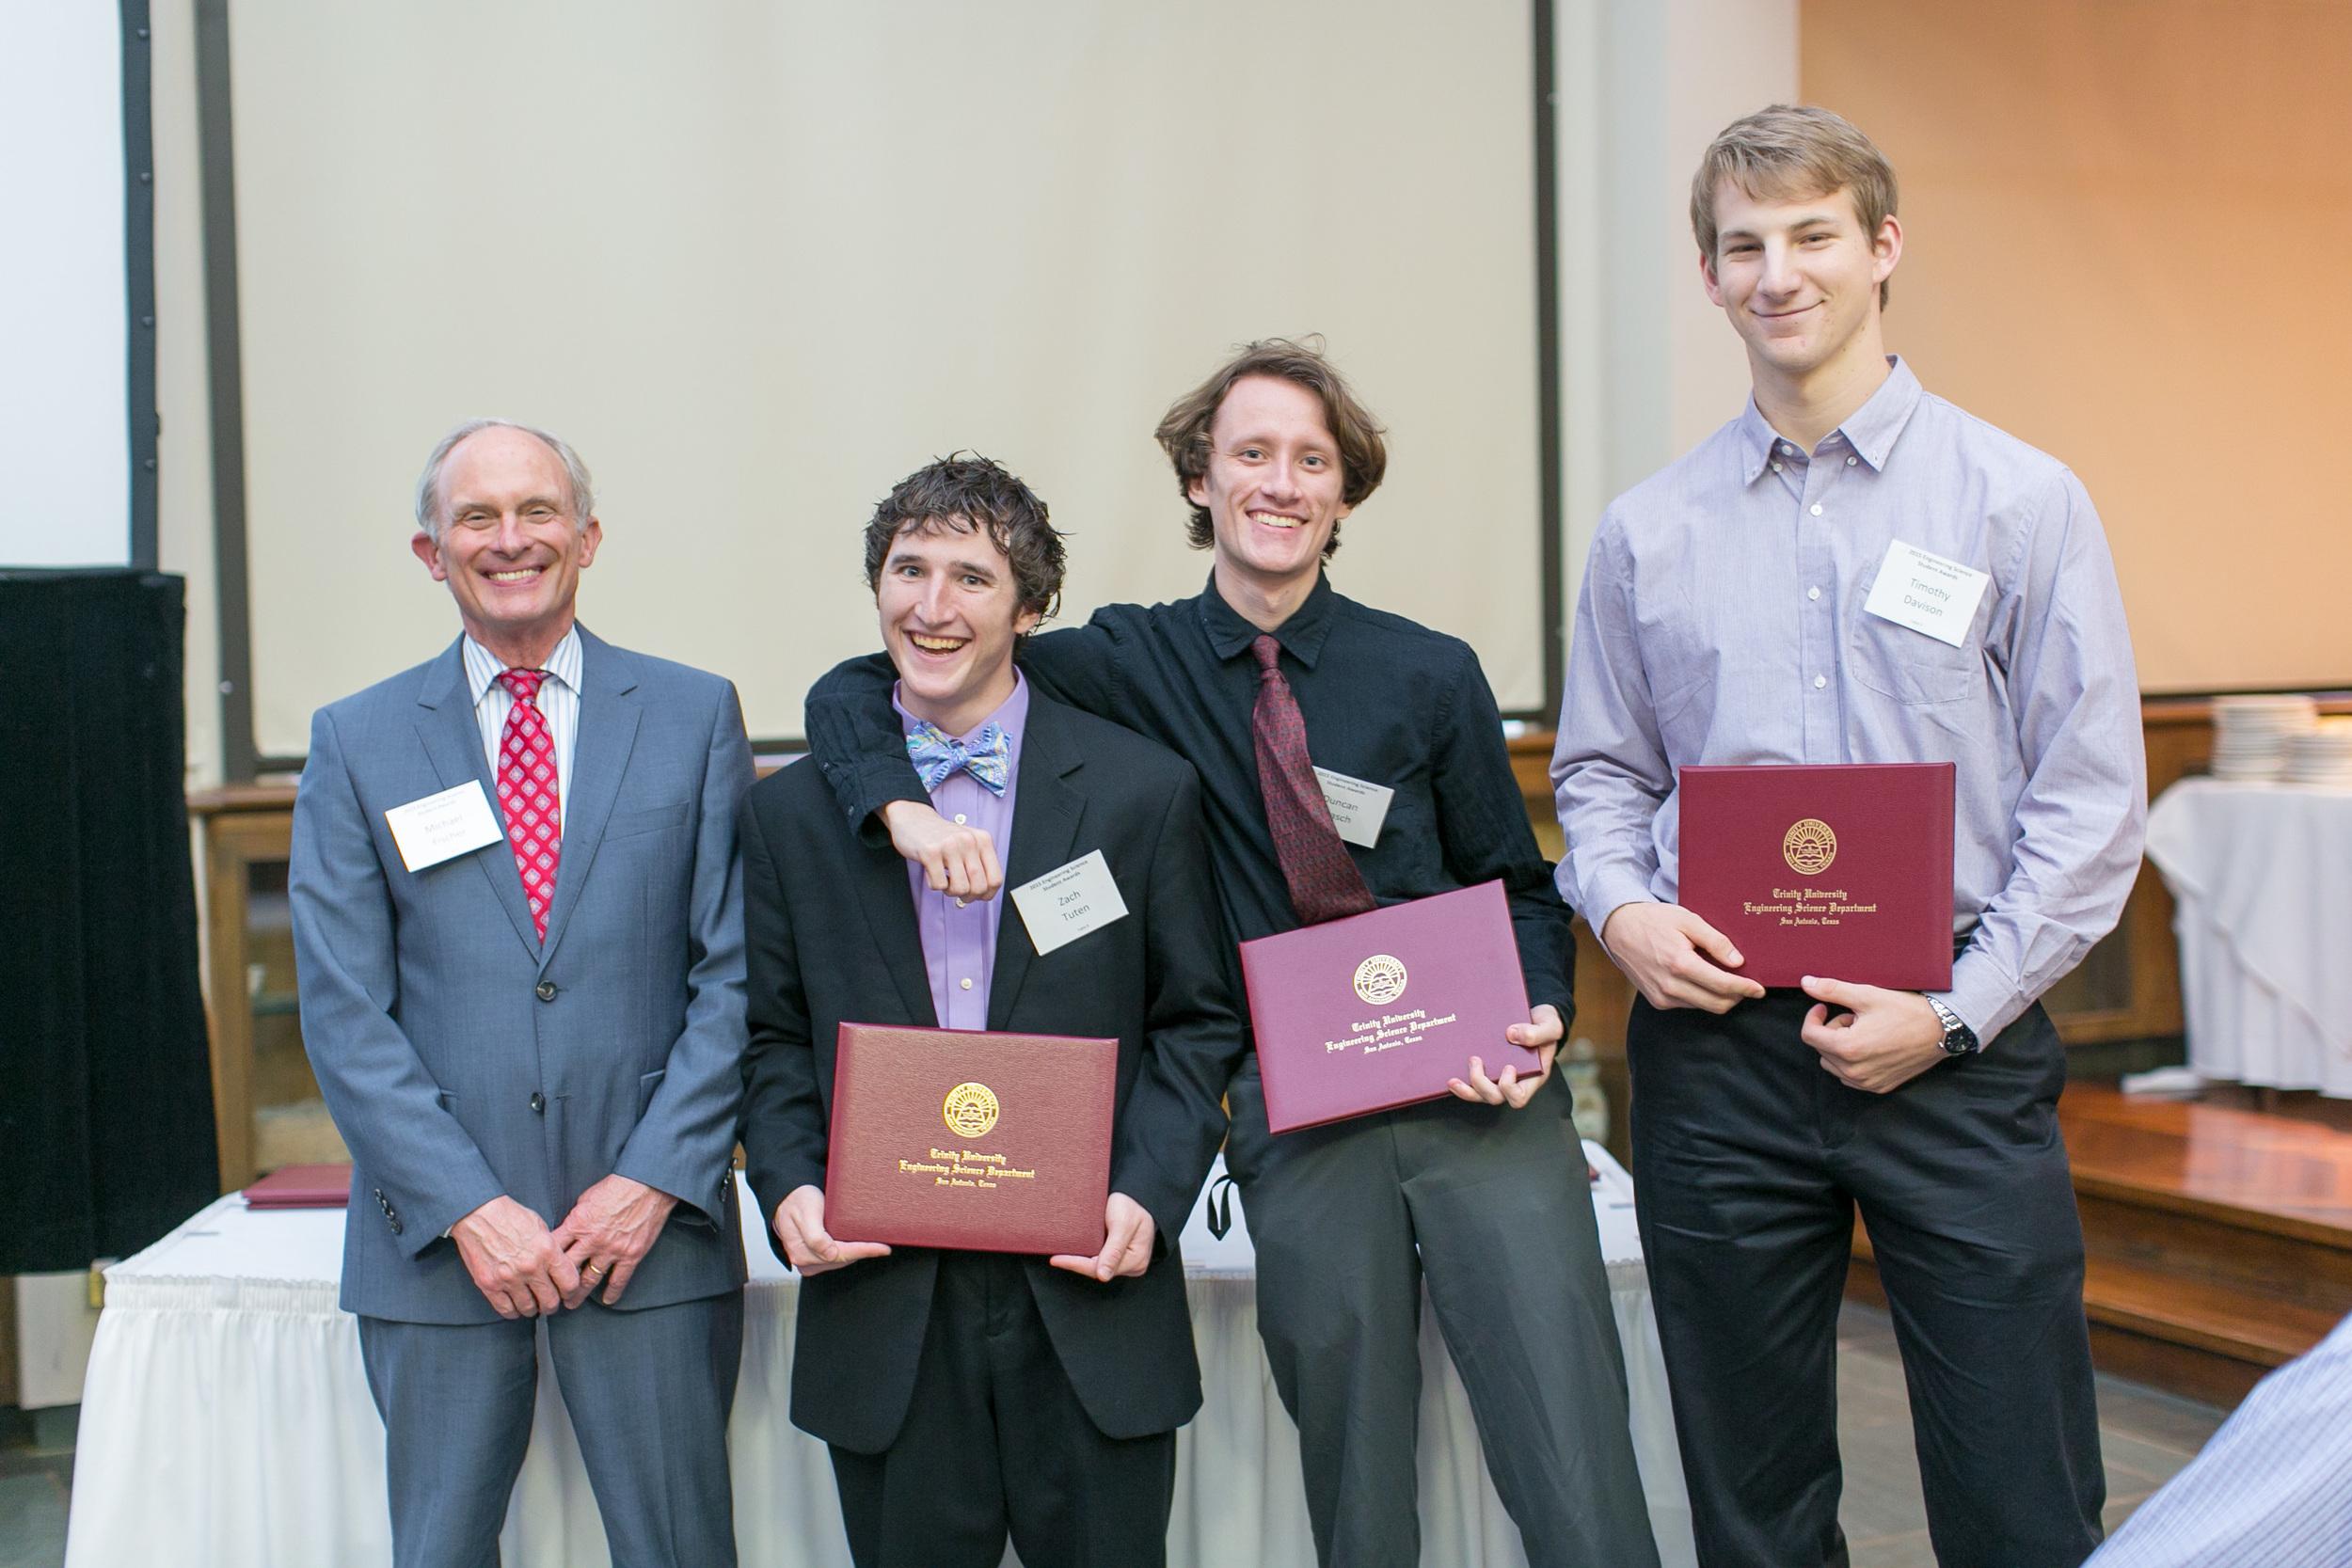 087-Engineering Awards.jpg